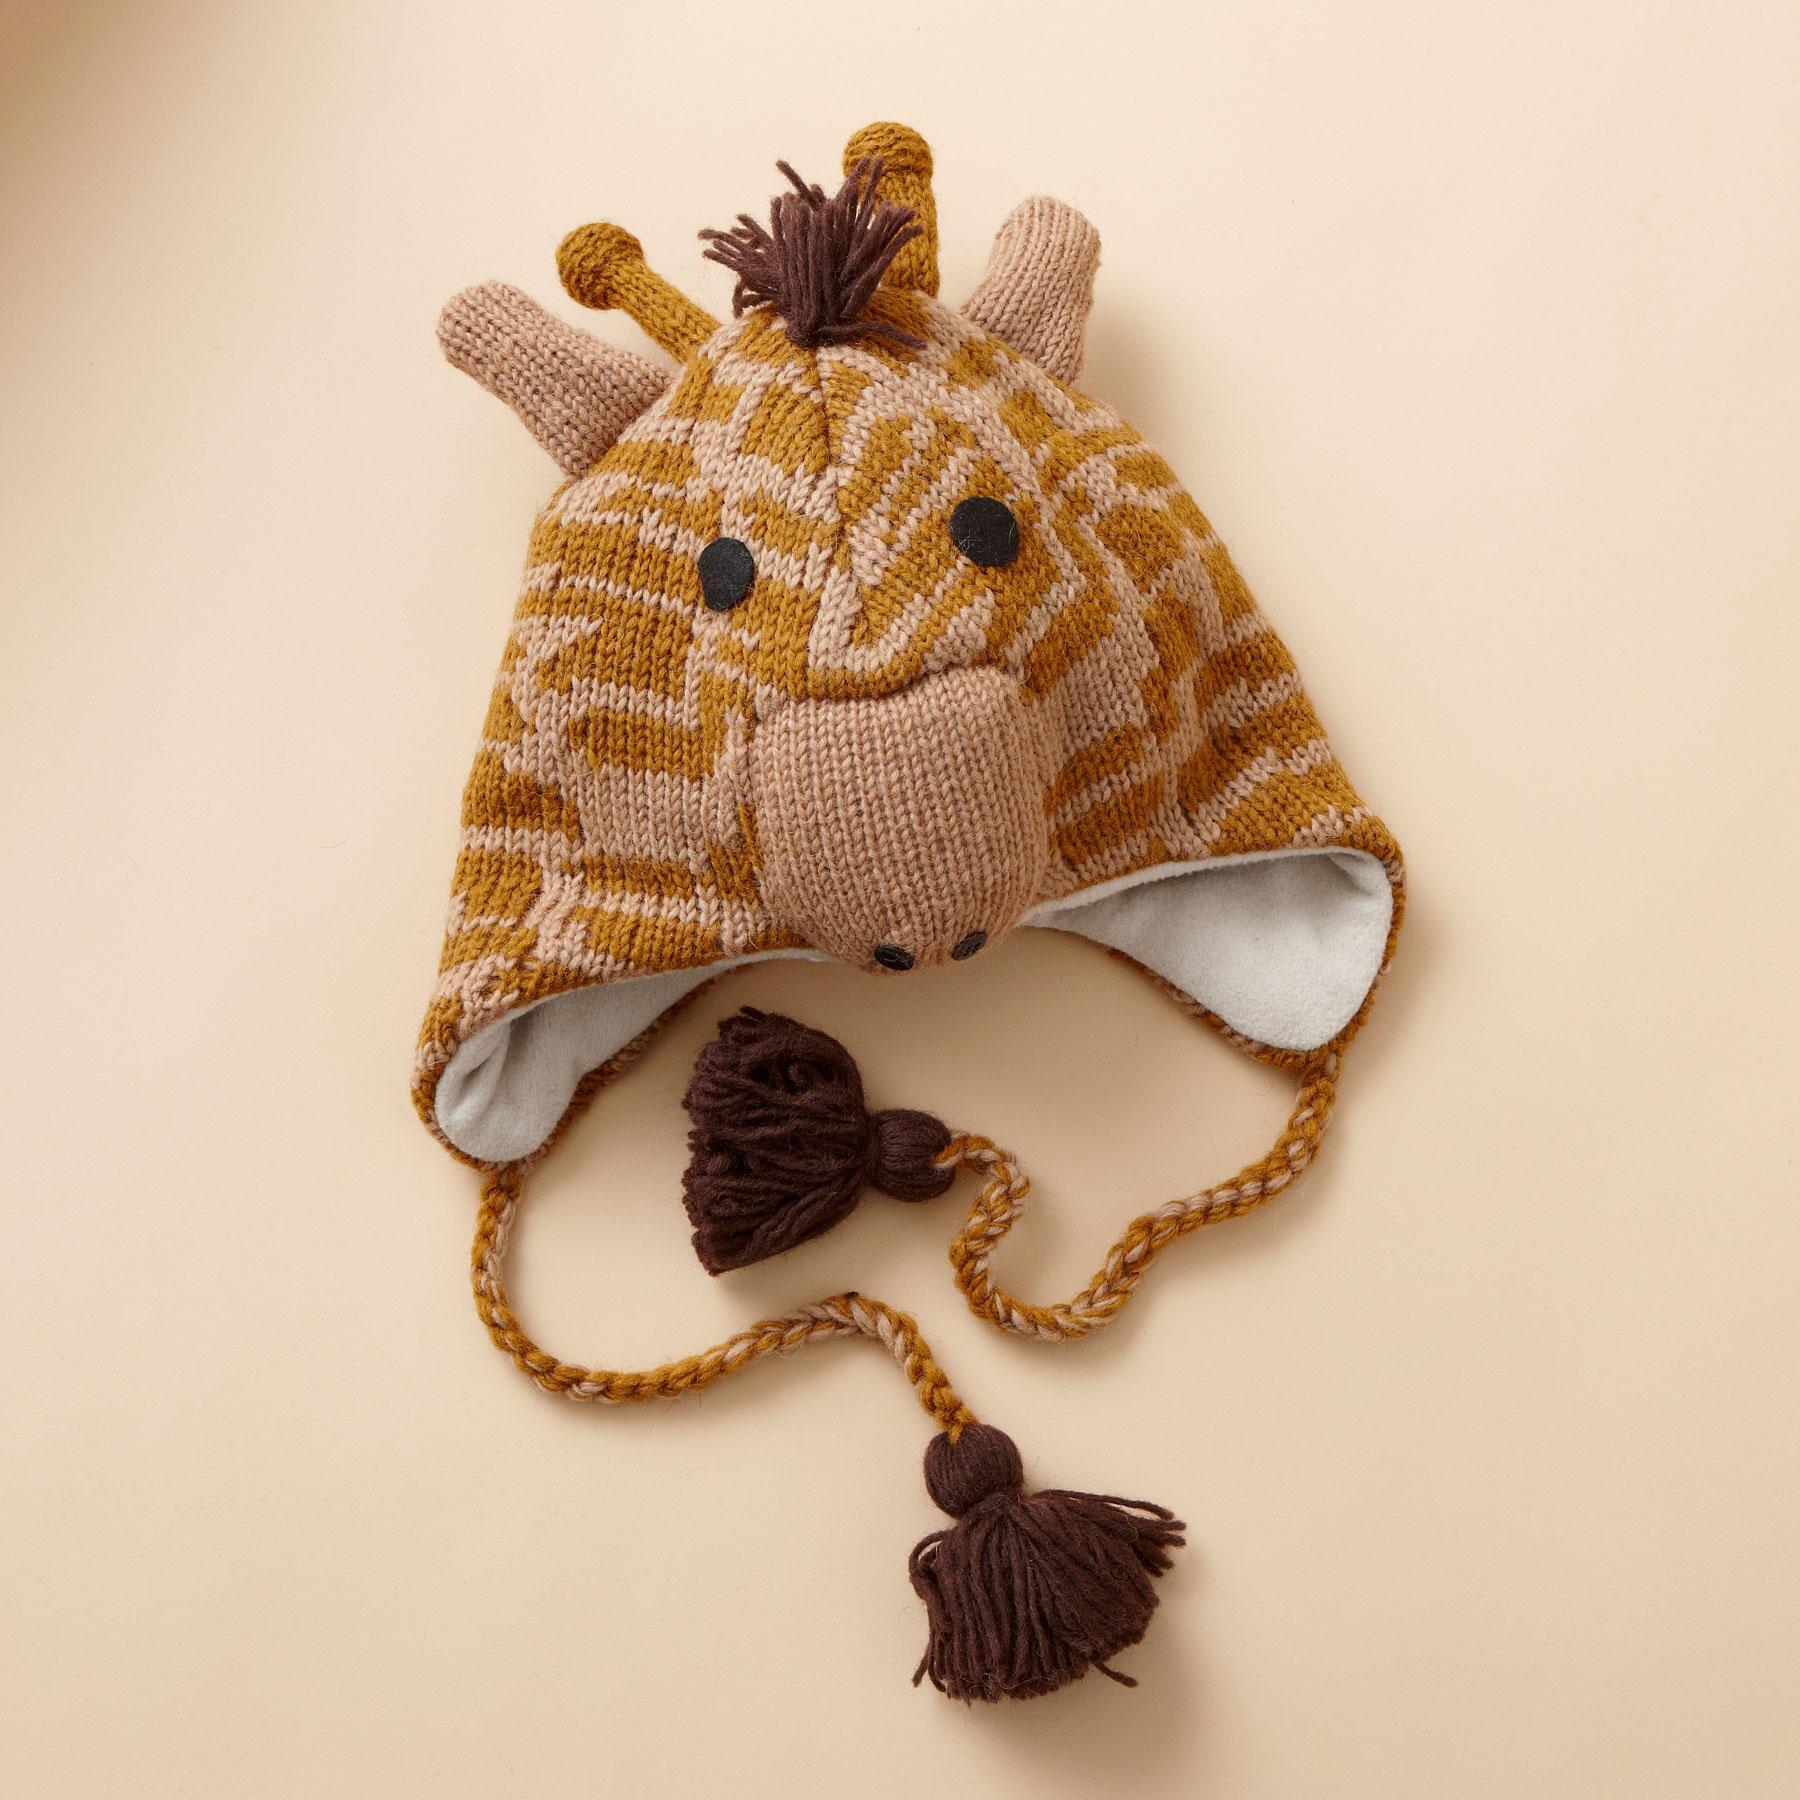 CREATURE COMFORT GIRAFFE HAT - Hats - All Accessories - Shoes ... 64b196938c4